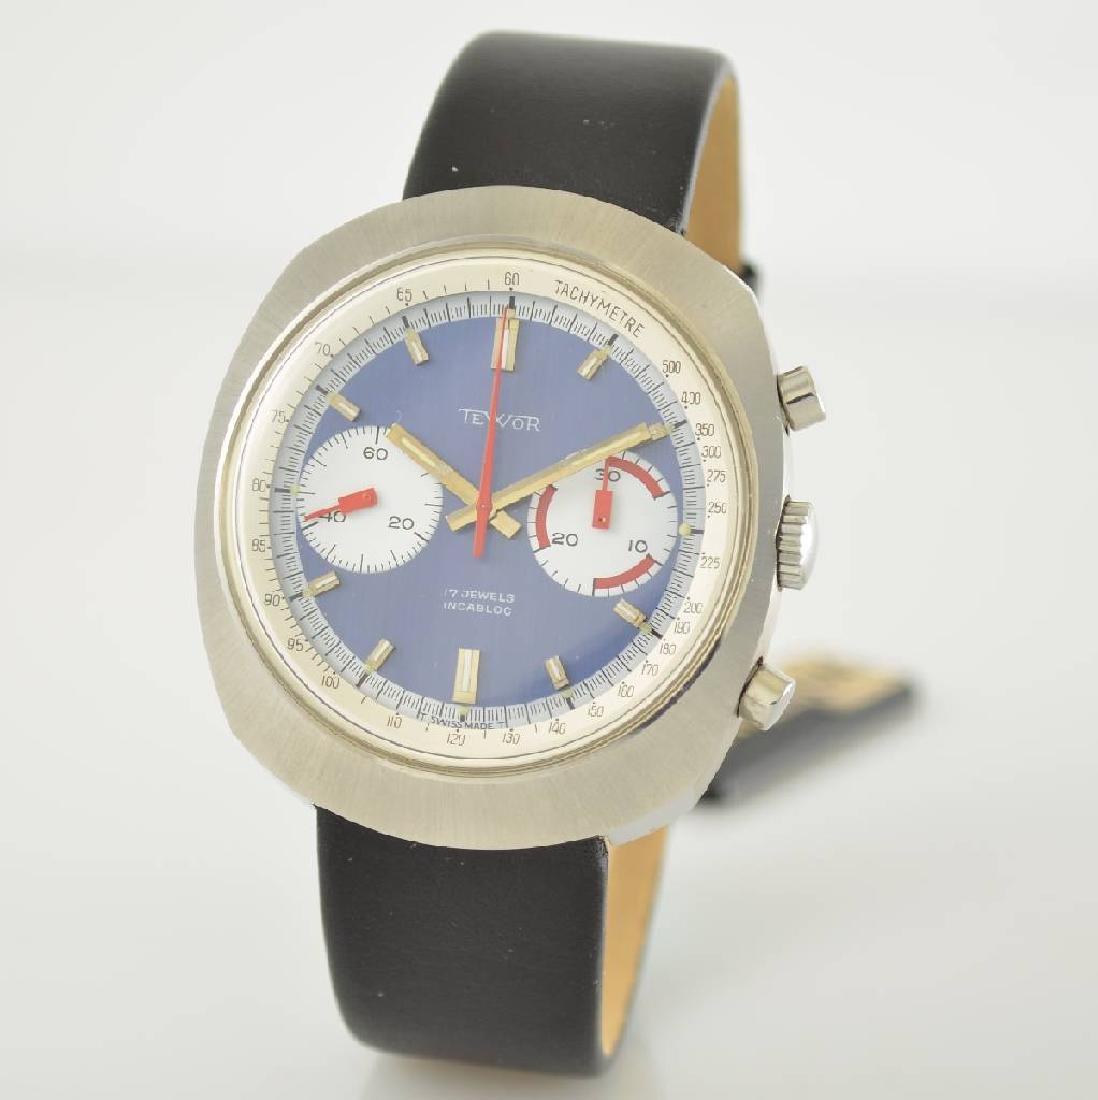 TEWOR unworn gents wristwatch with chronograph - 3